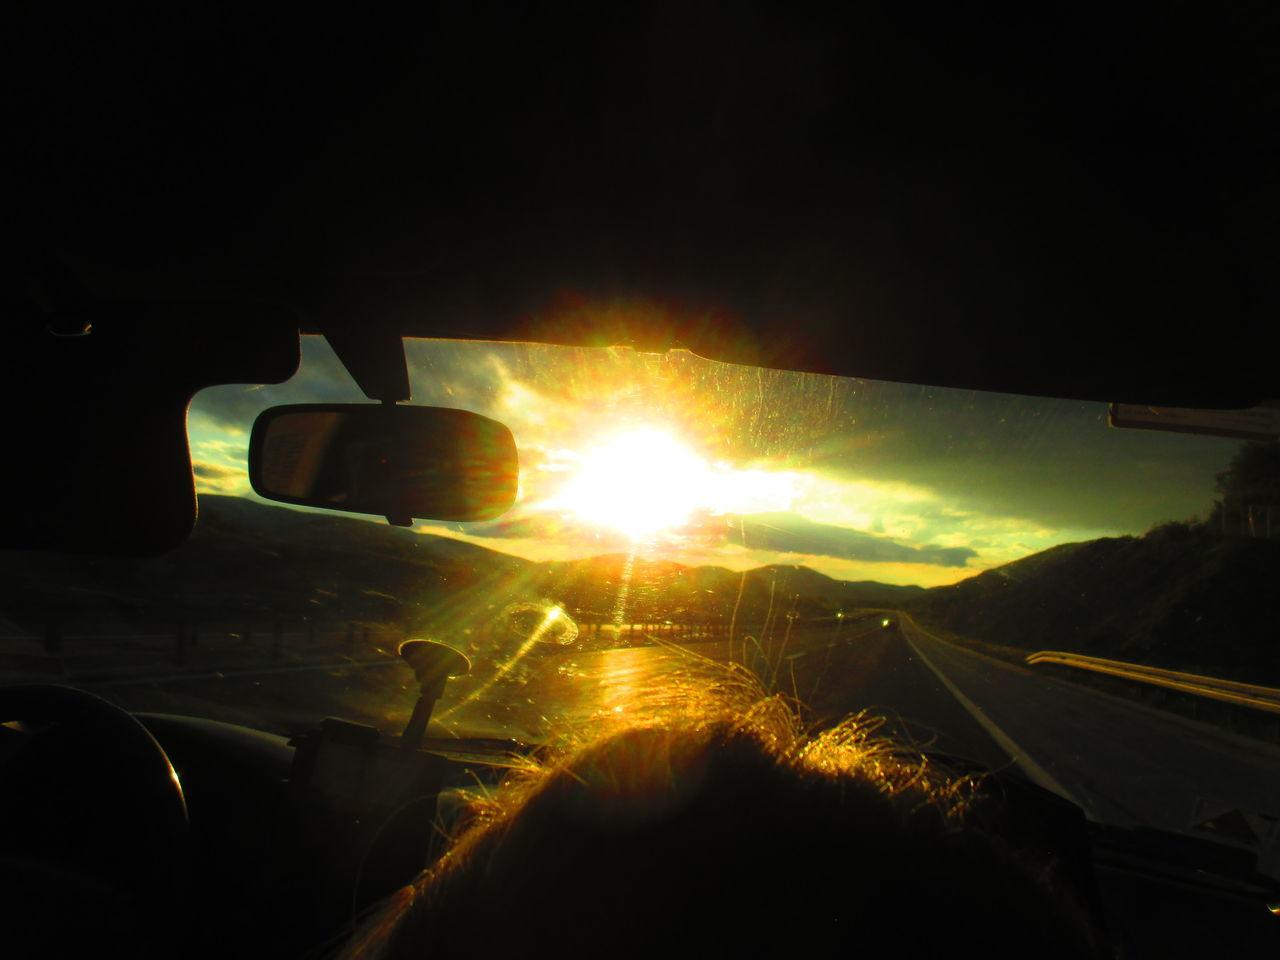 In Car Lens Flare Silhouette Sun Sunbeam Sunset